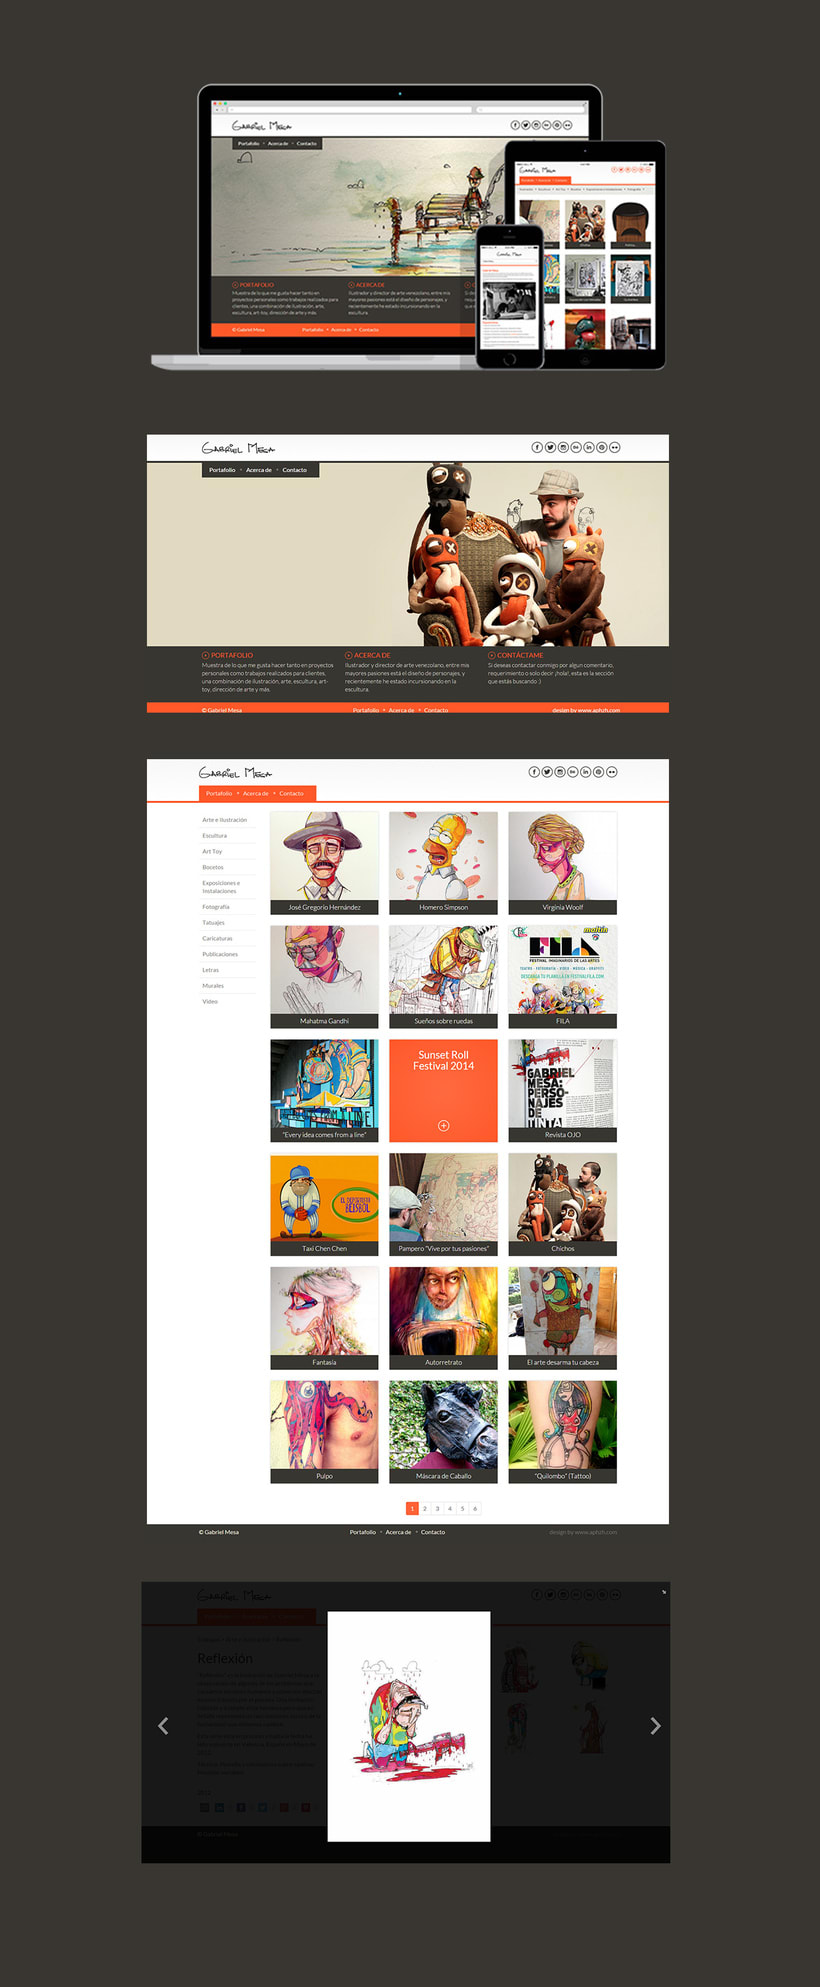 Gabriel Mesa - Graphic design and wordpress web development -1